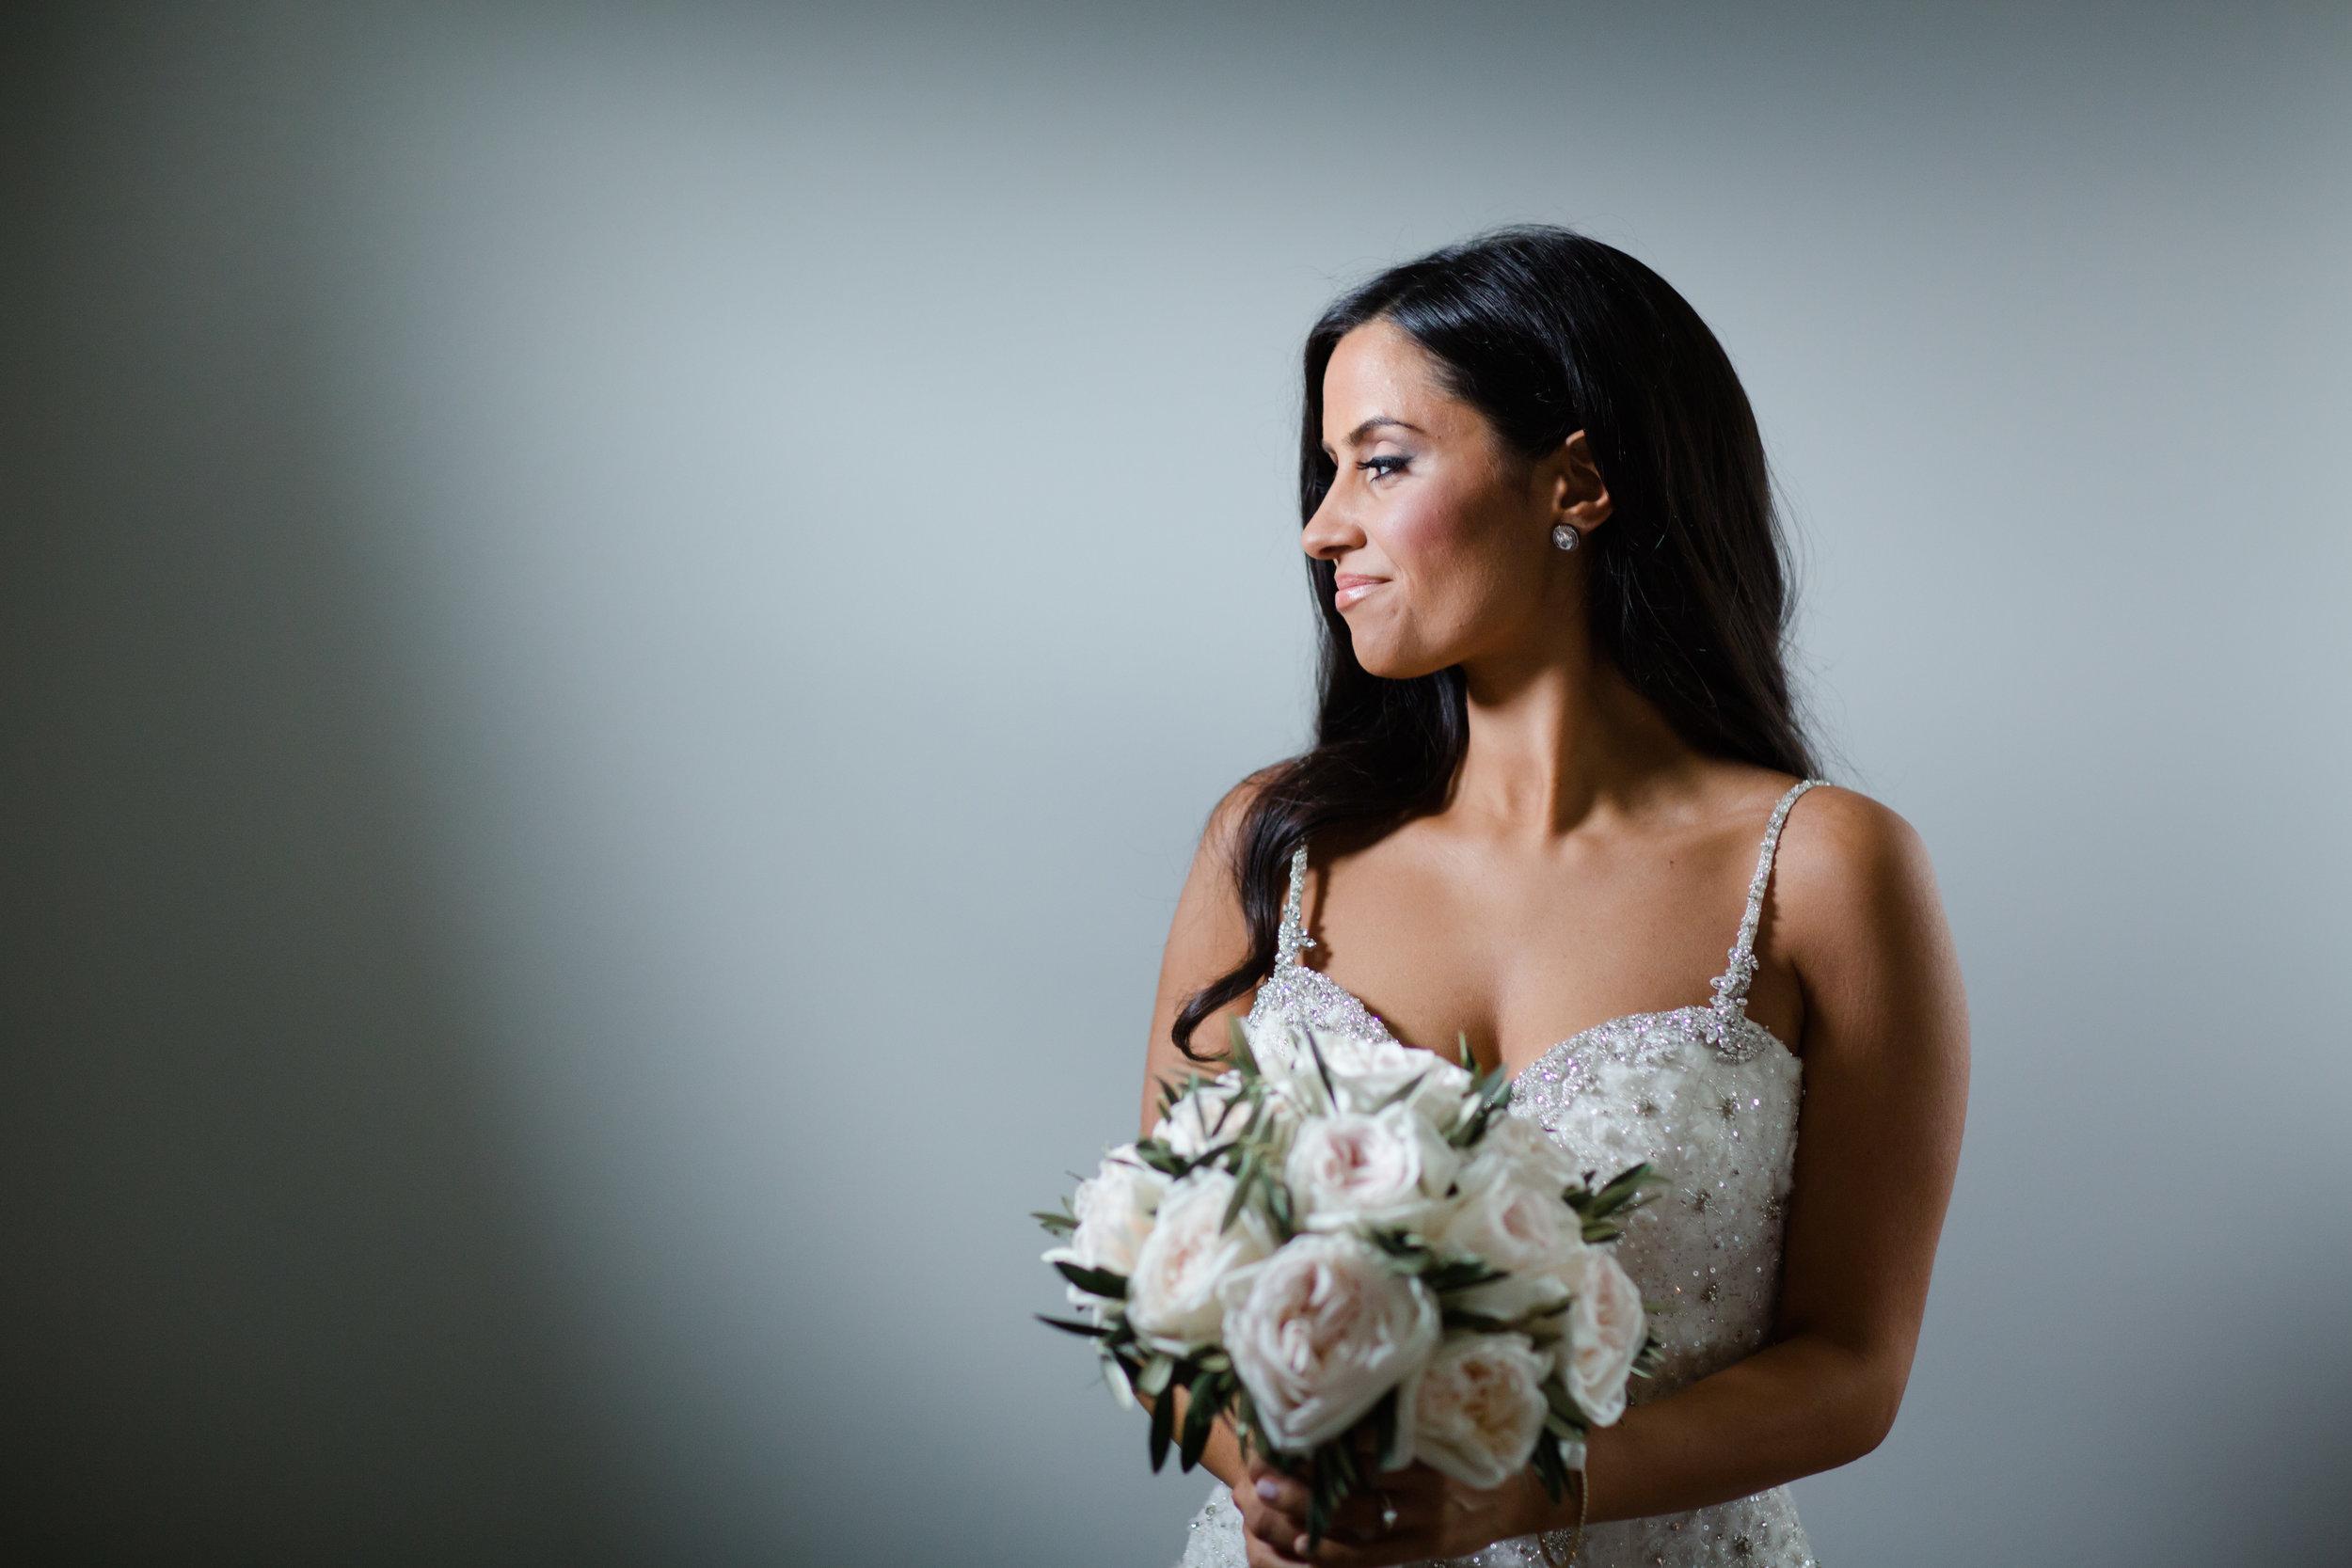 Ballgown style wedding gown - destination Kiawah Island, South Carolina wedding